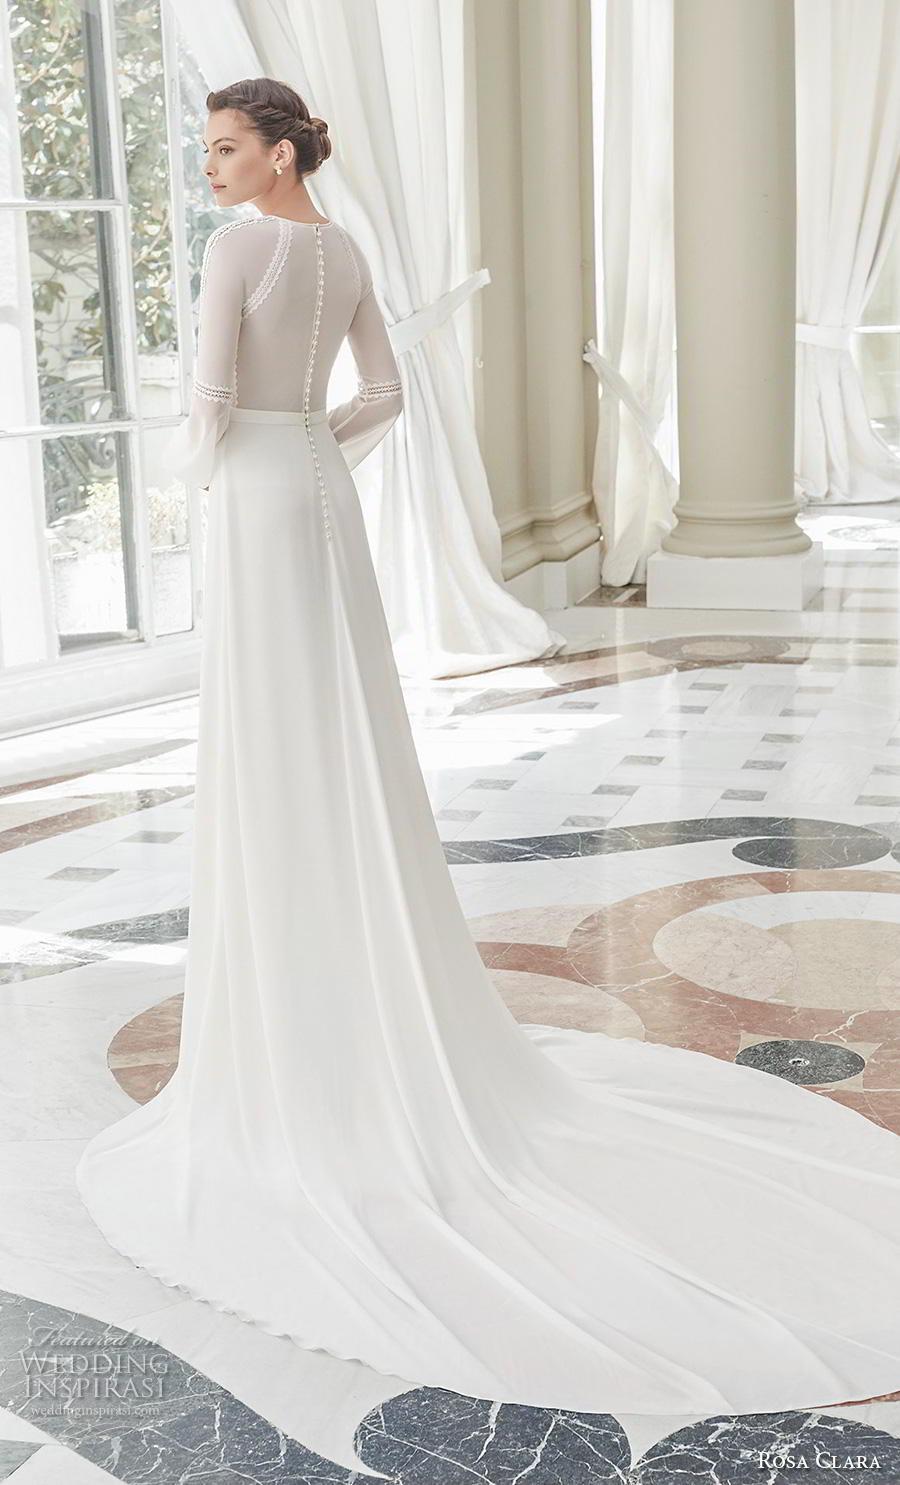 rosa clara 2019 couture bridal long bishop sleeves jewel neck heavily embellished bodice slit skirt elegant modified a  line wedding dress covered back chapel train (3) bv